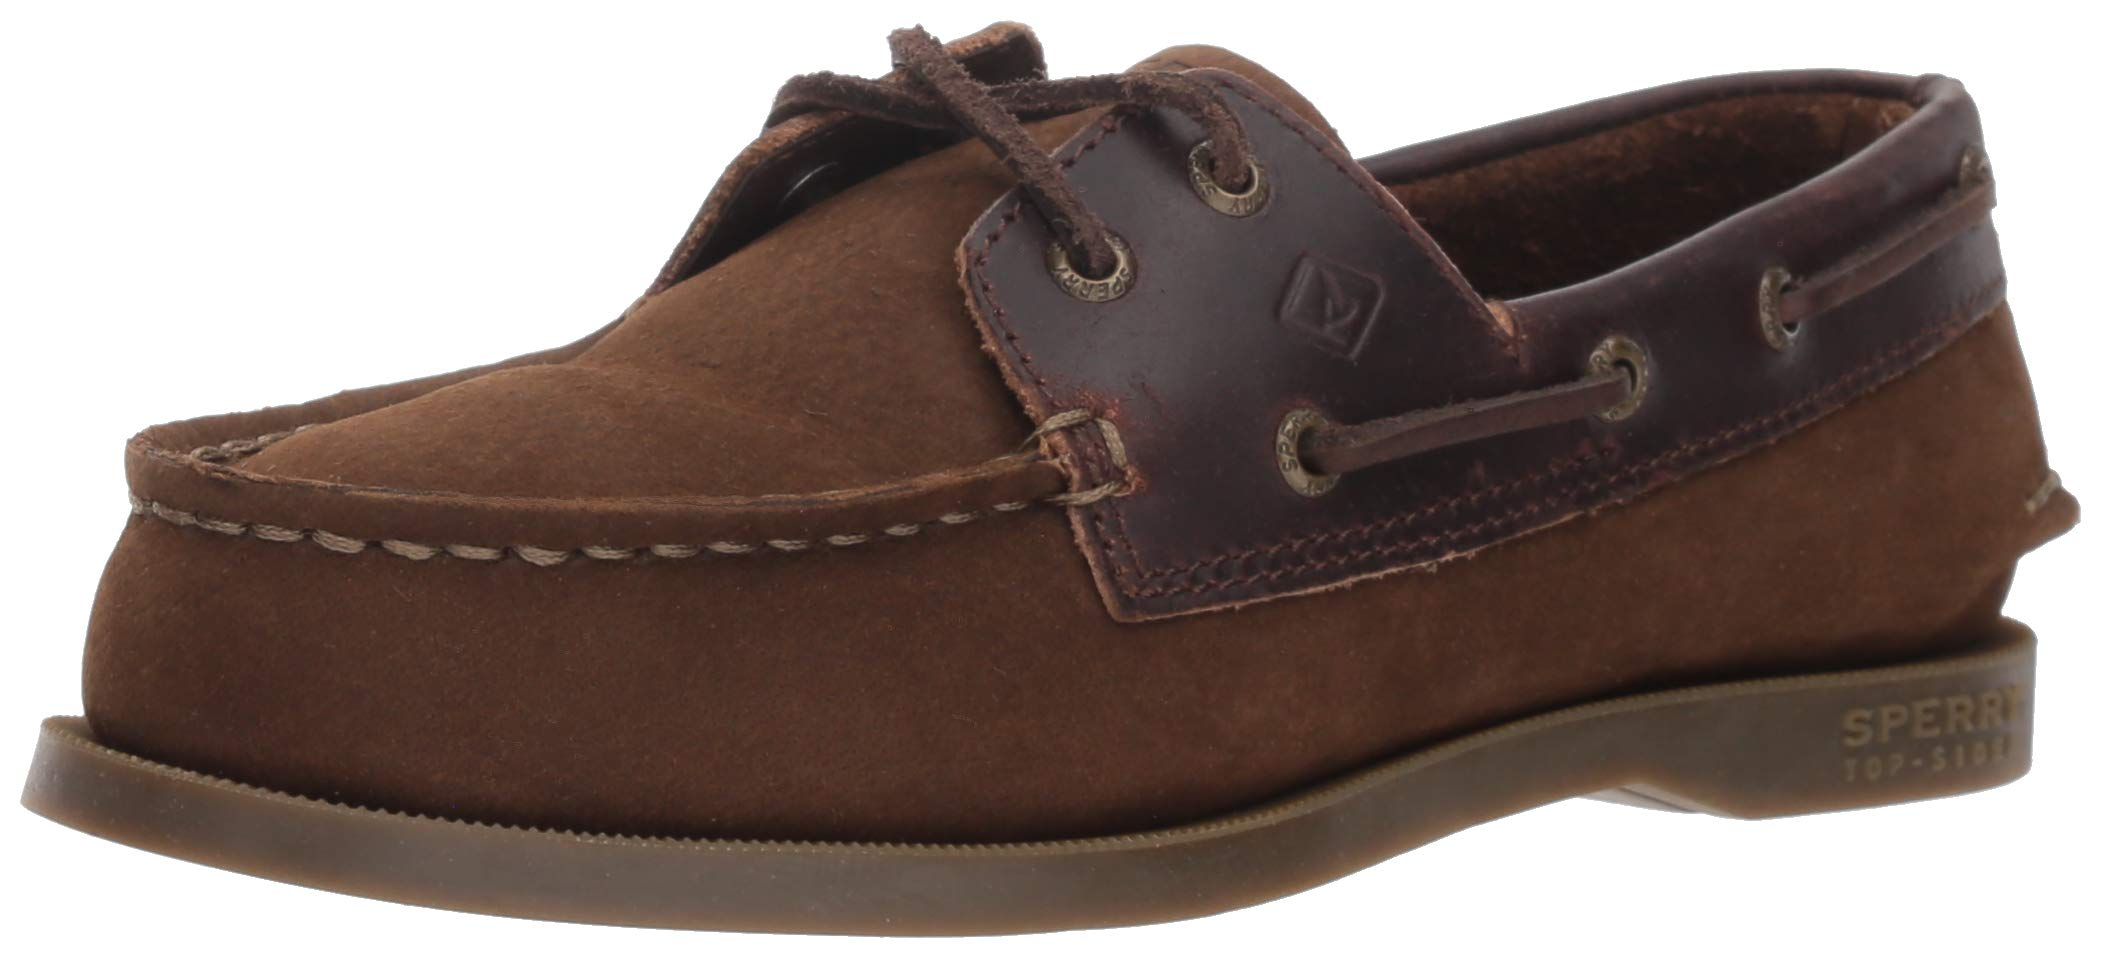 SPERRY Boys' Authentic Original Boat Shoe, Brown Buck, 4.5 Medium US Big Kid